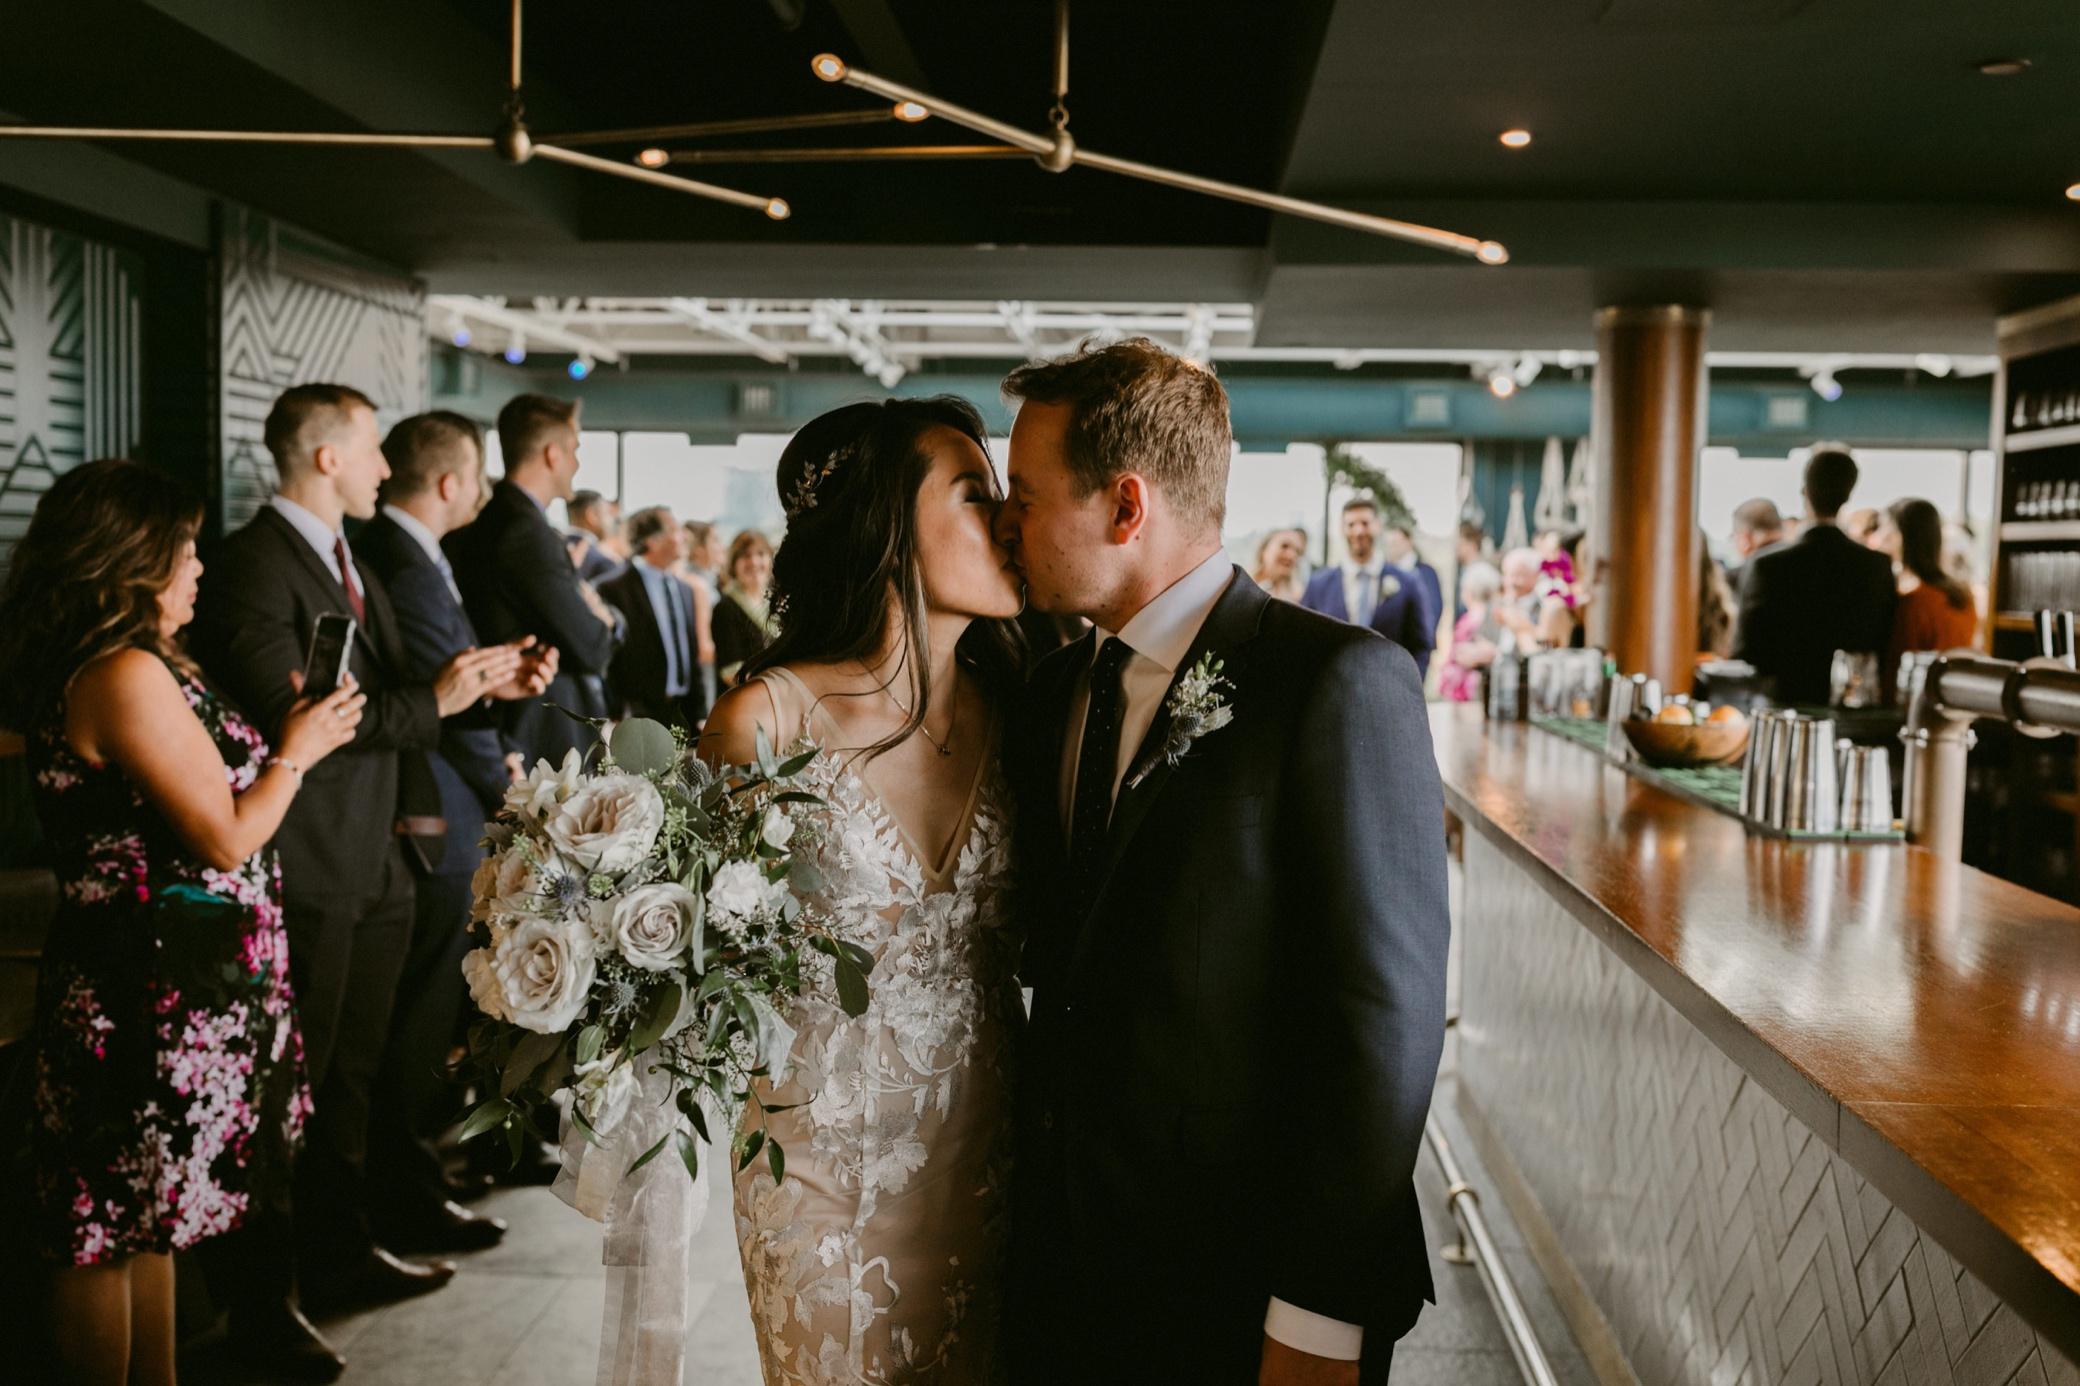 070_The Broadview Hotel Wedding (469 of 913).jpg